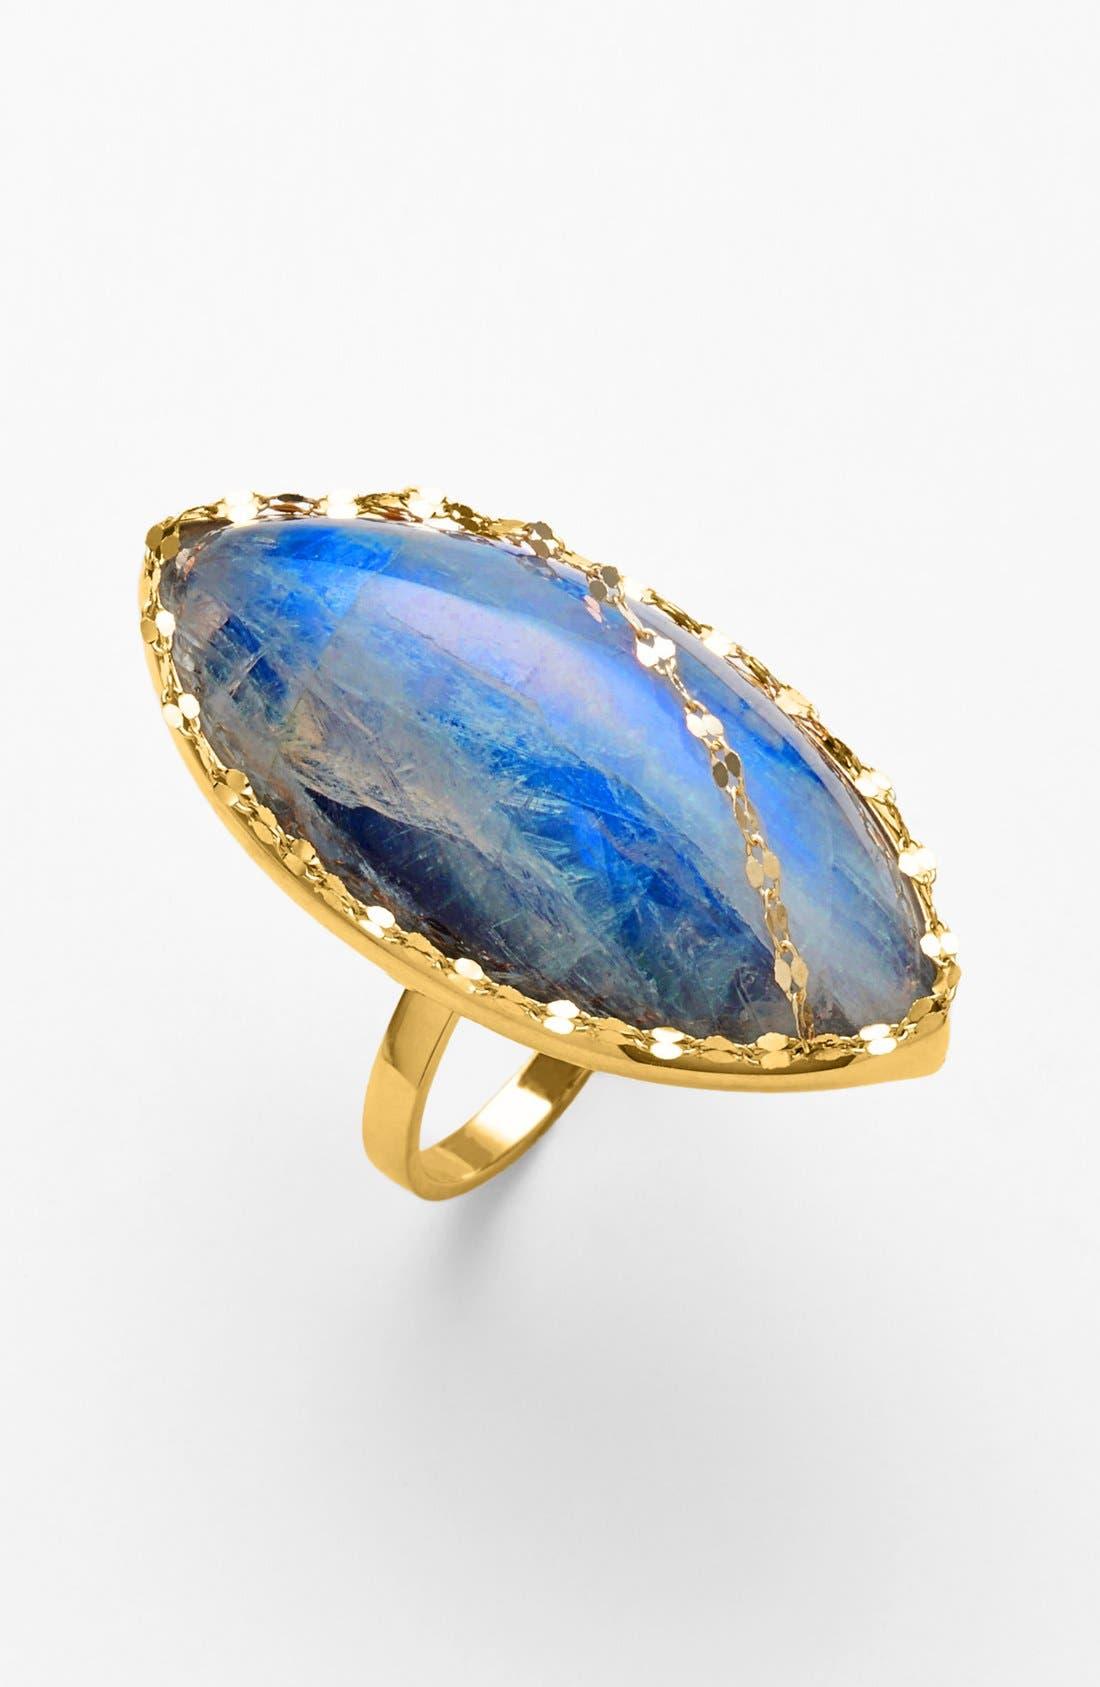 Main Image - Lana Jewelry 'Mesmerize - Mood' Stone Statement Ring